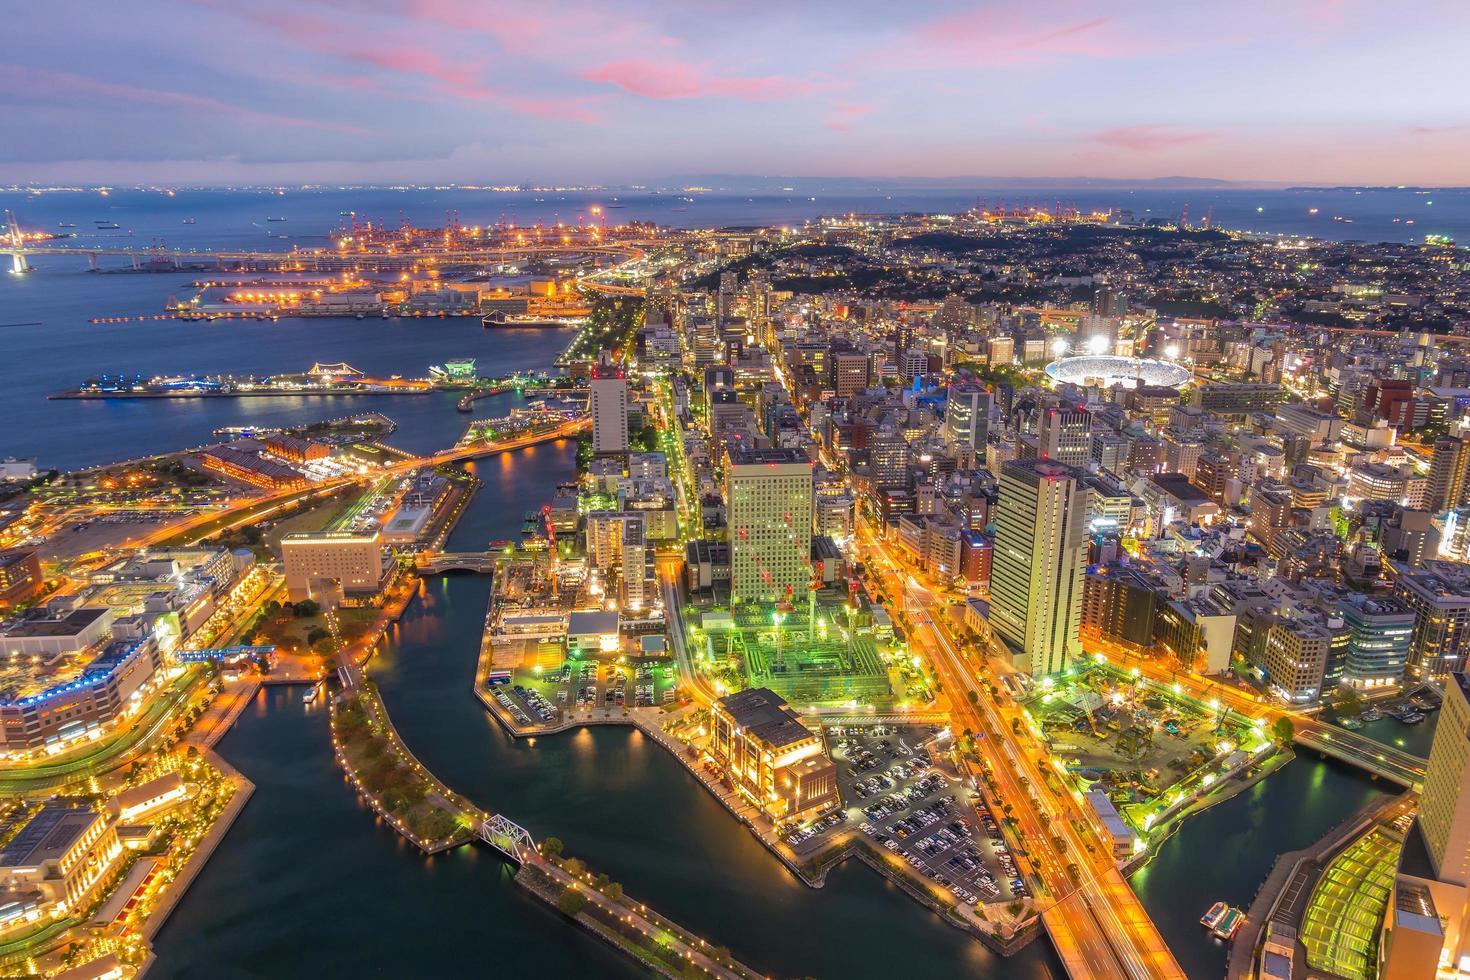 Yokohama city skyline from top view at sunset photo